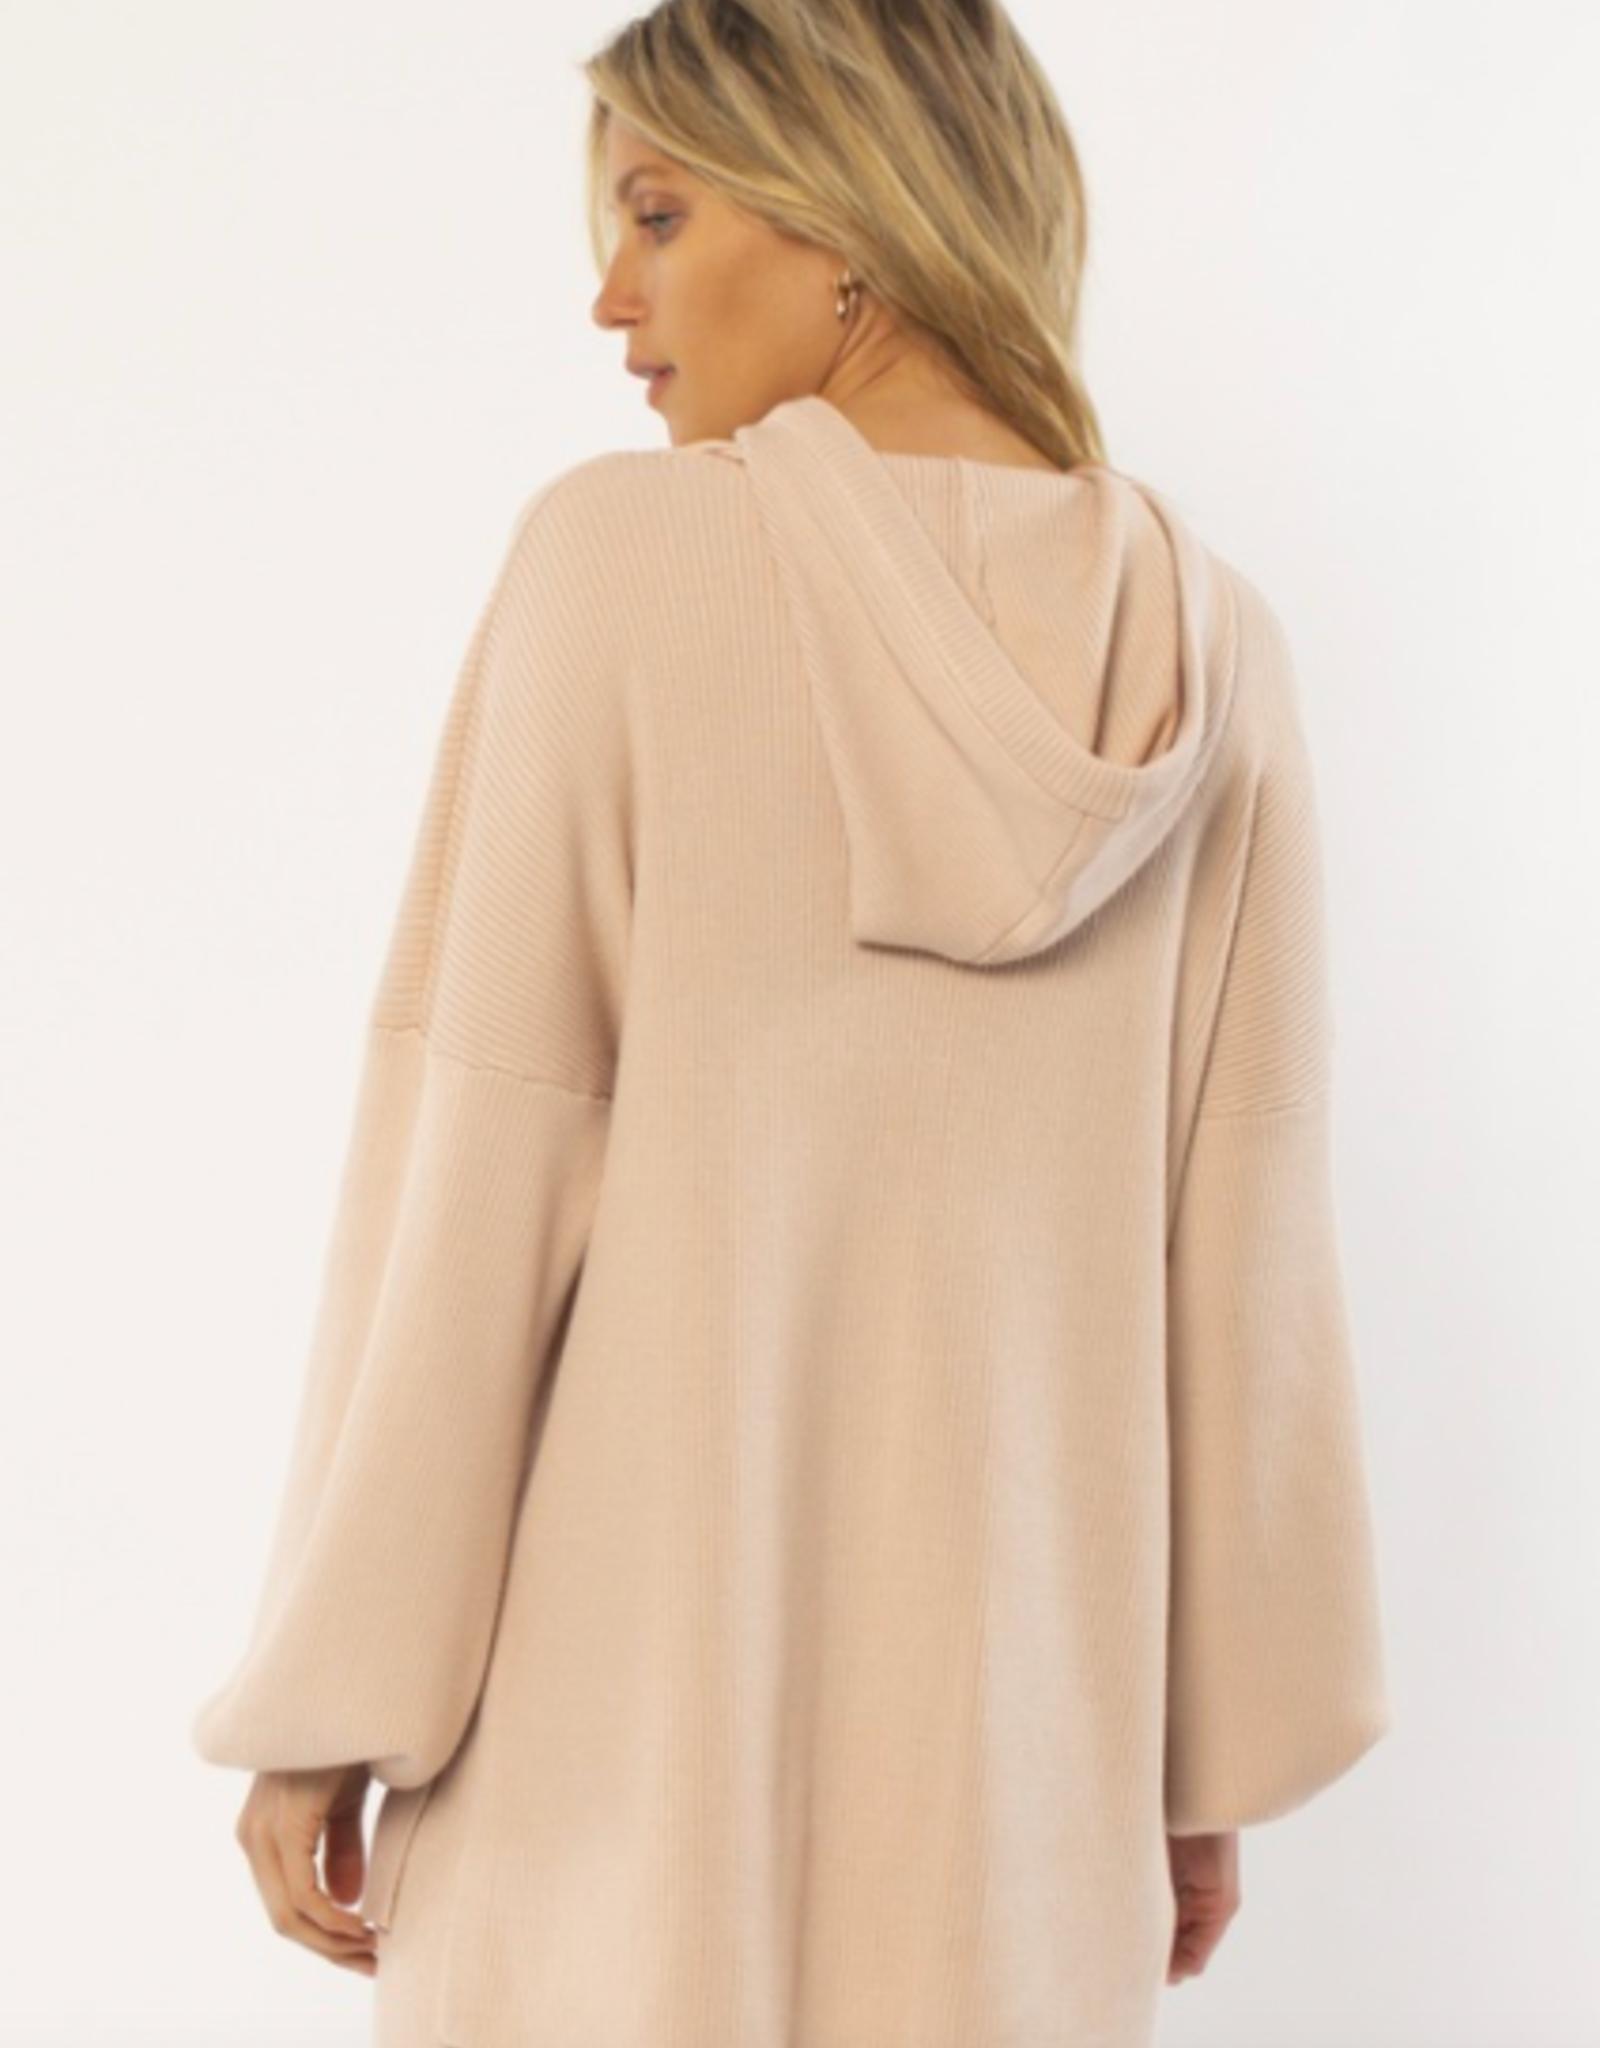 Amuse Women's Maxwell Long Sleeve Knit Sweater